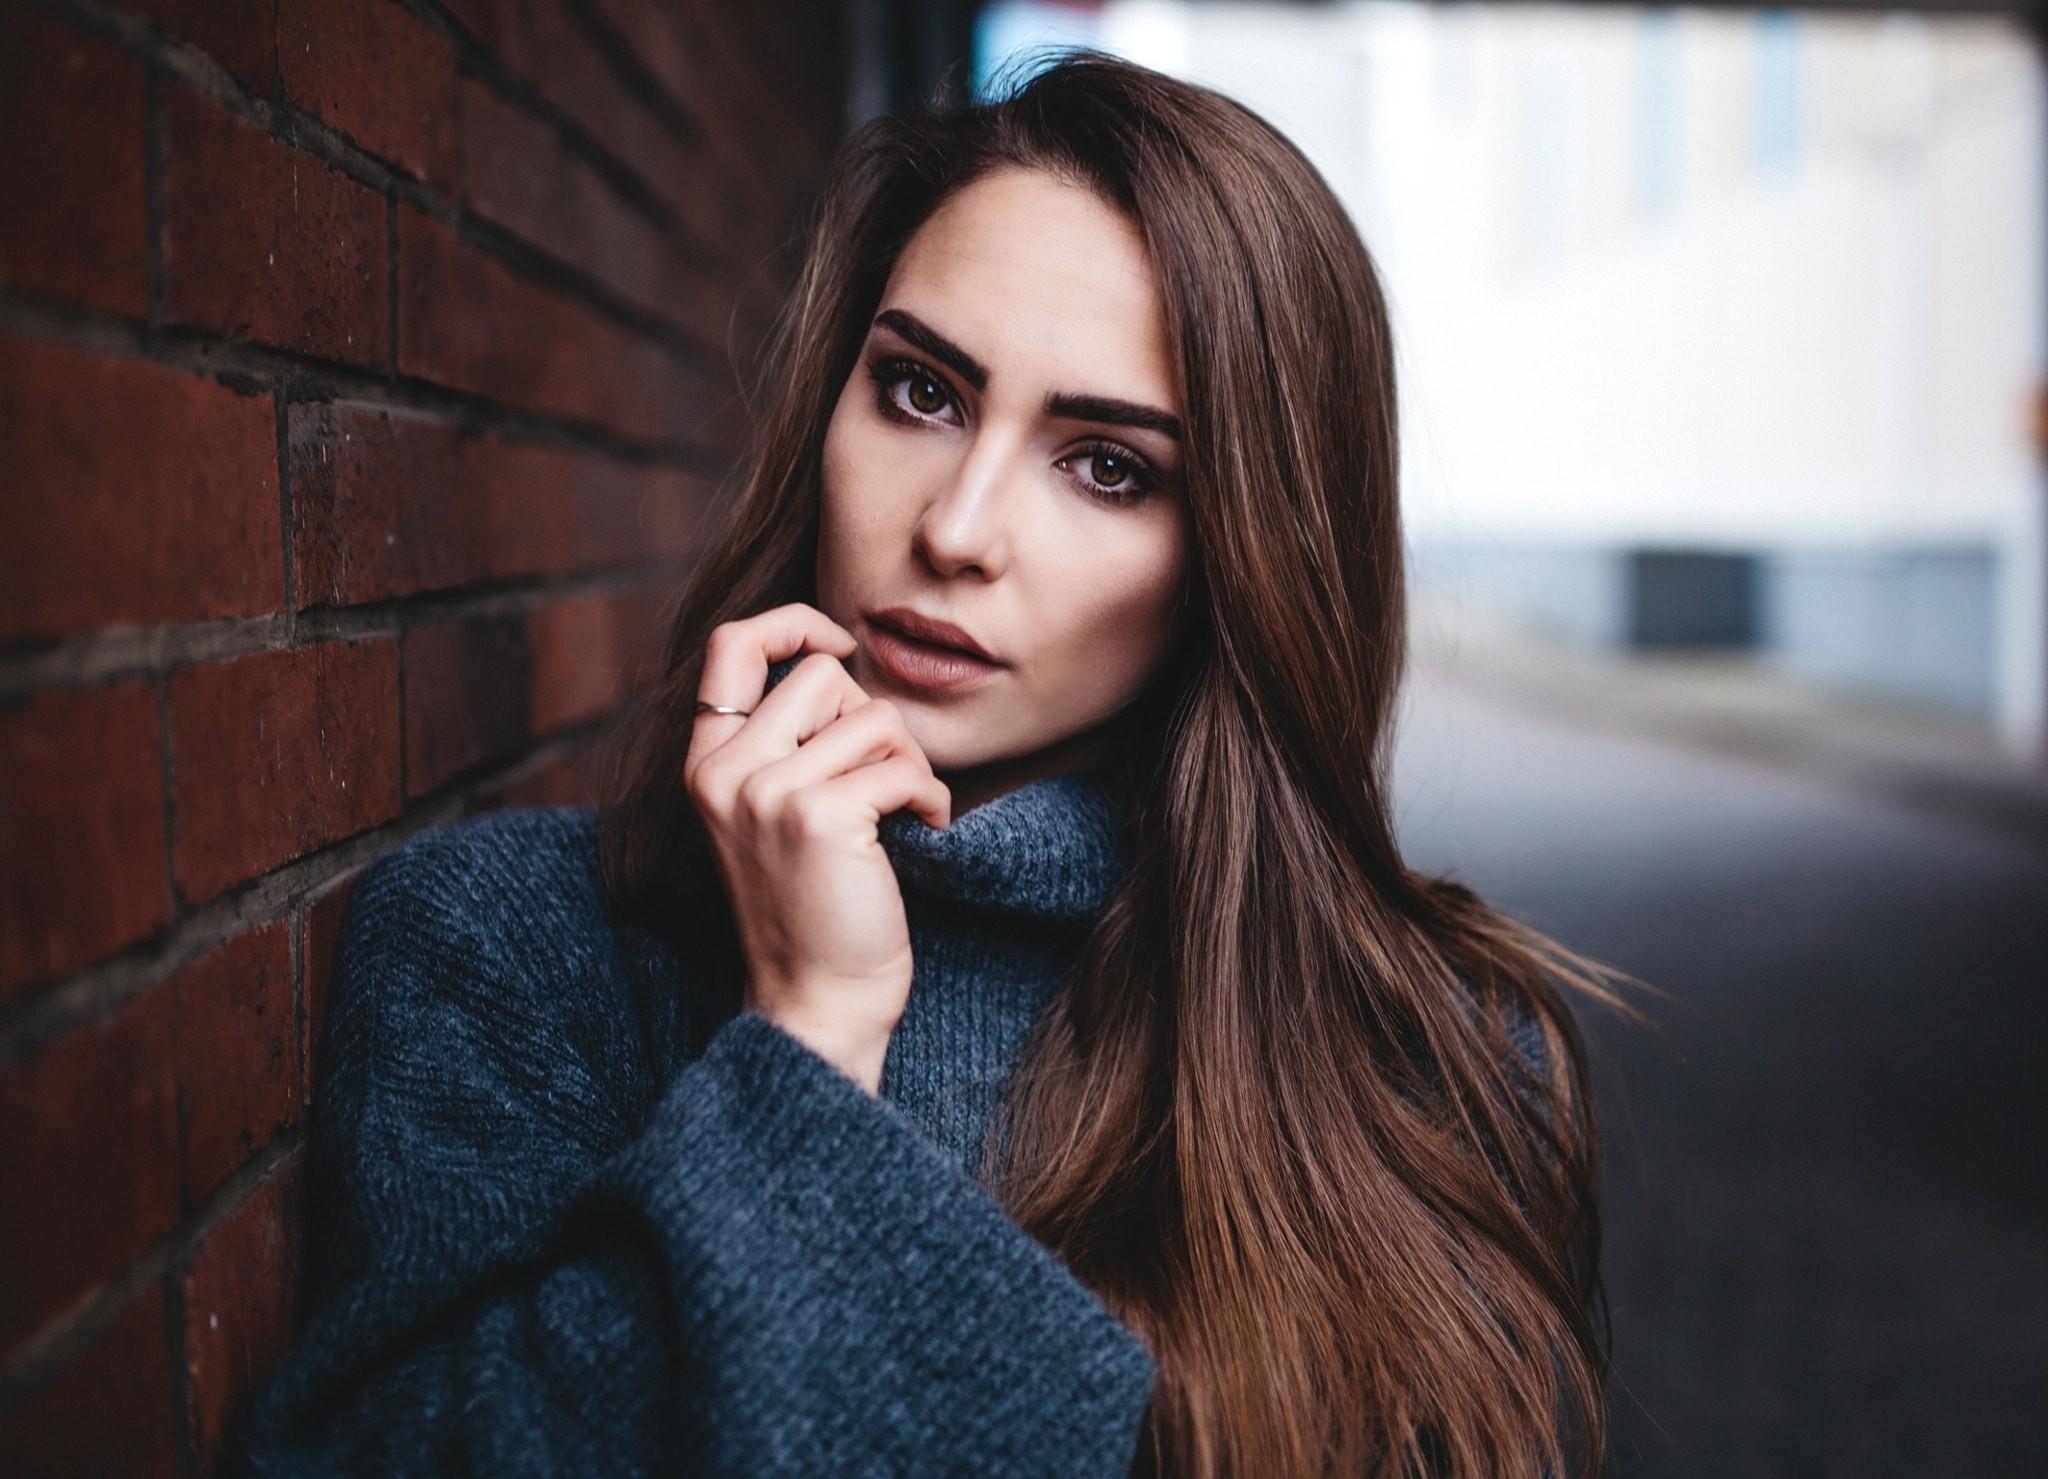 People 2048x1479 women face portrait bricks wall depth of field long hair brown eyes straight hair sweater women outdoors blue sweater touching face